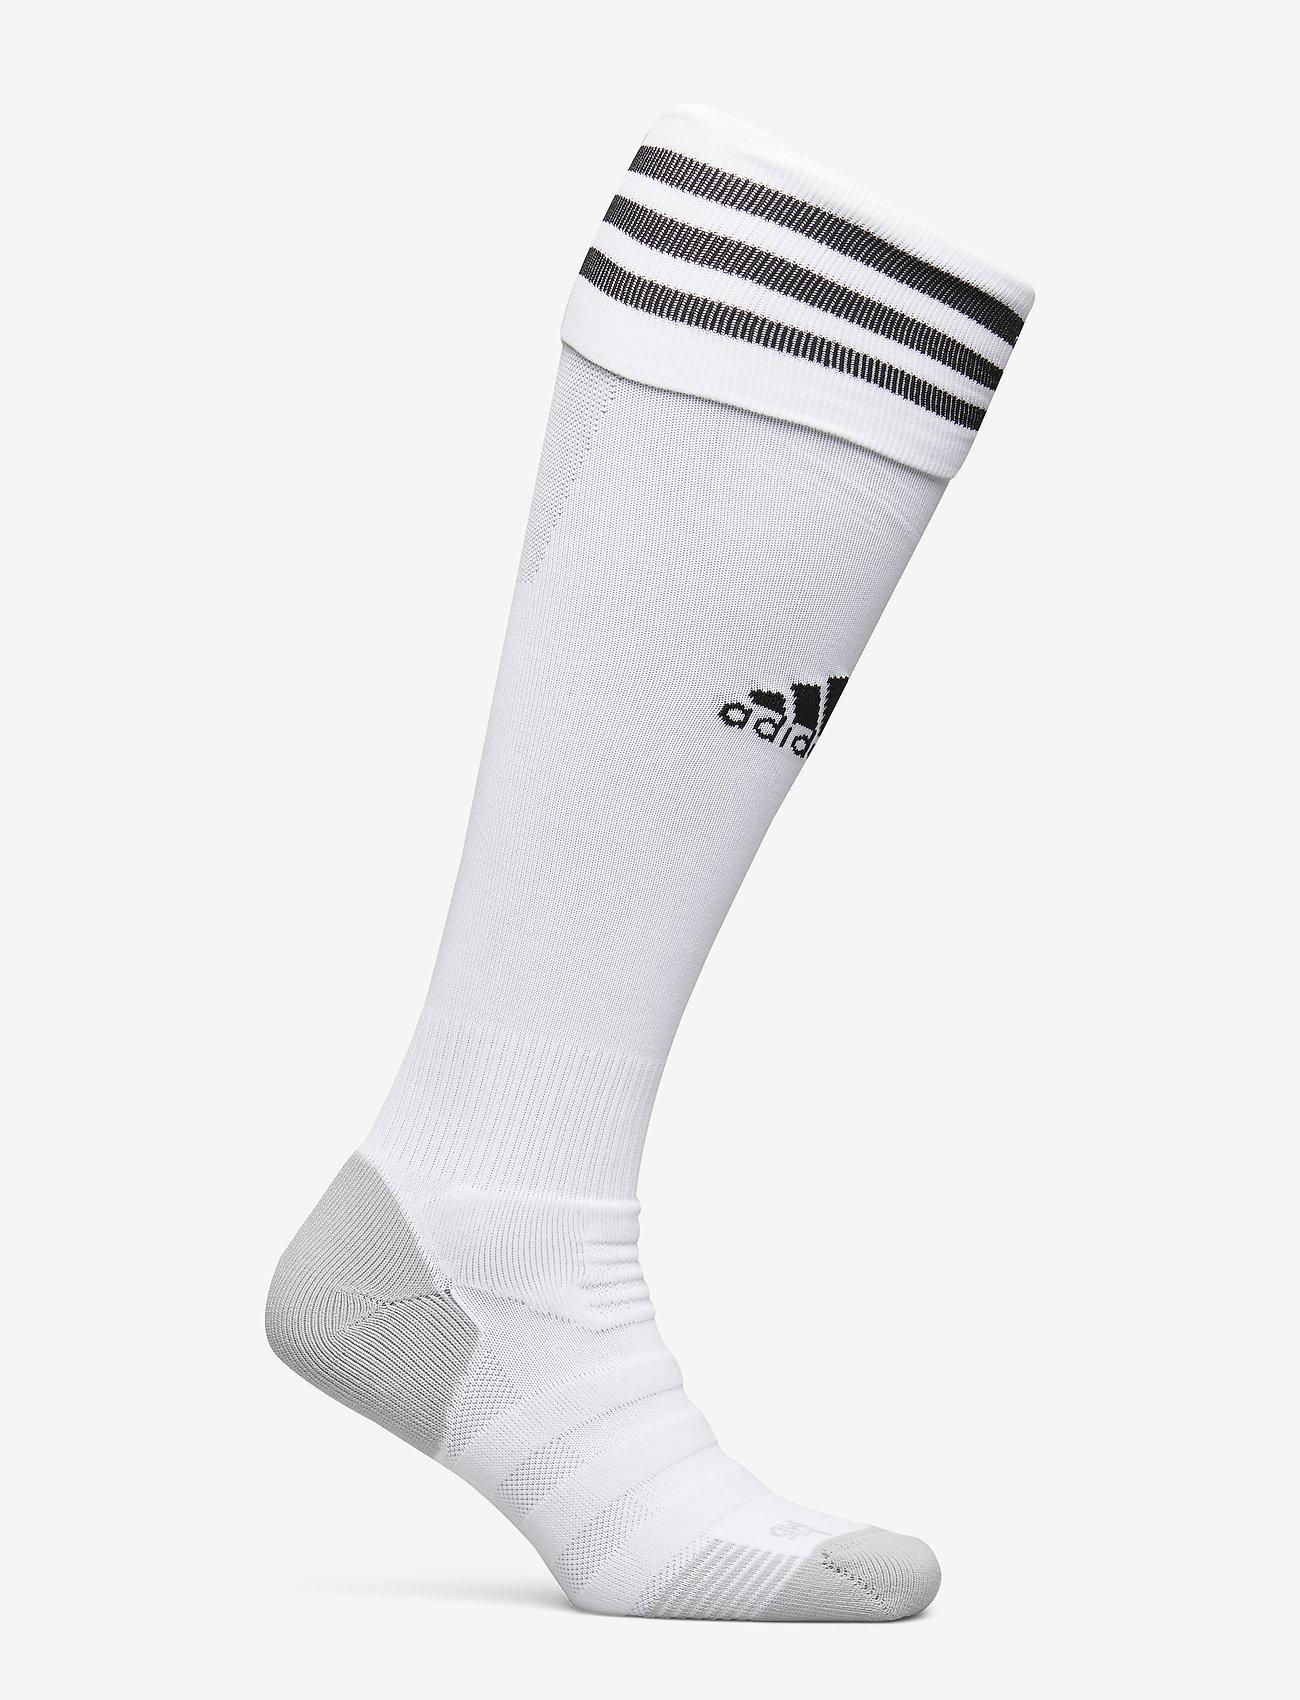 adidas Performance - ADI SOCK 18 - fußballsocken - white/black - 1